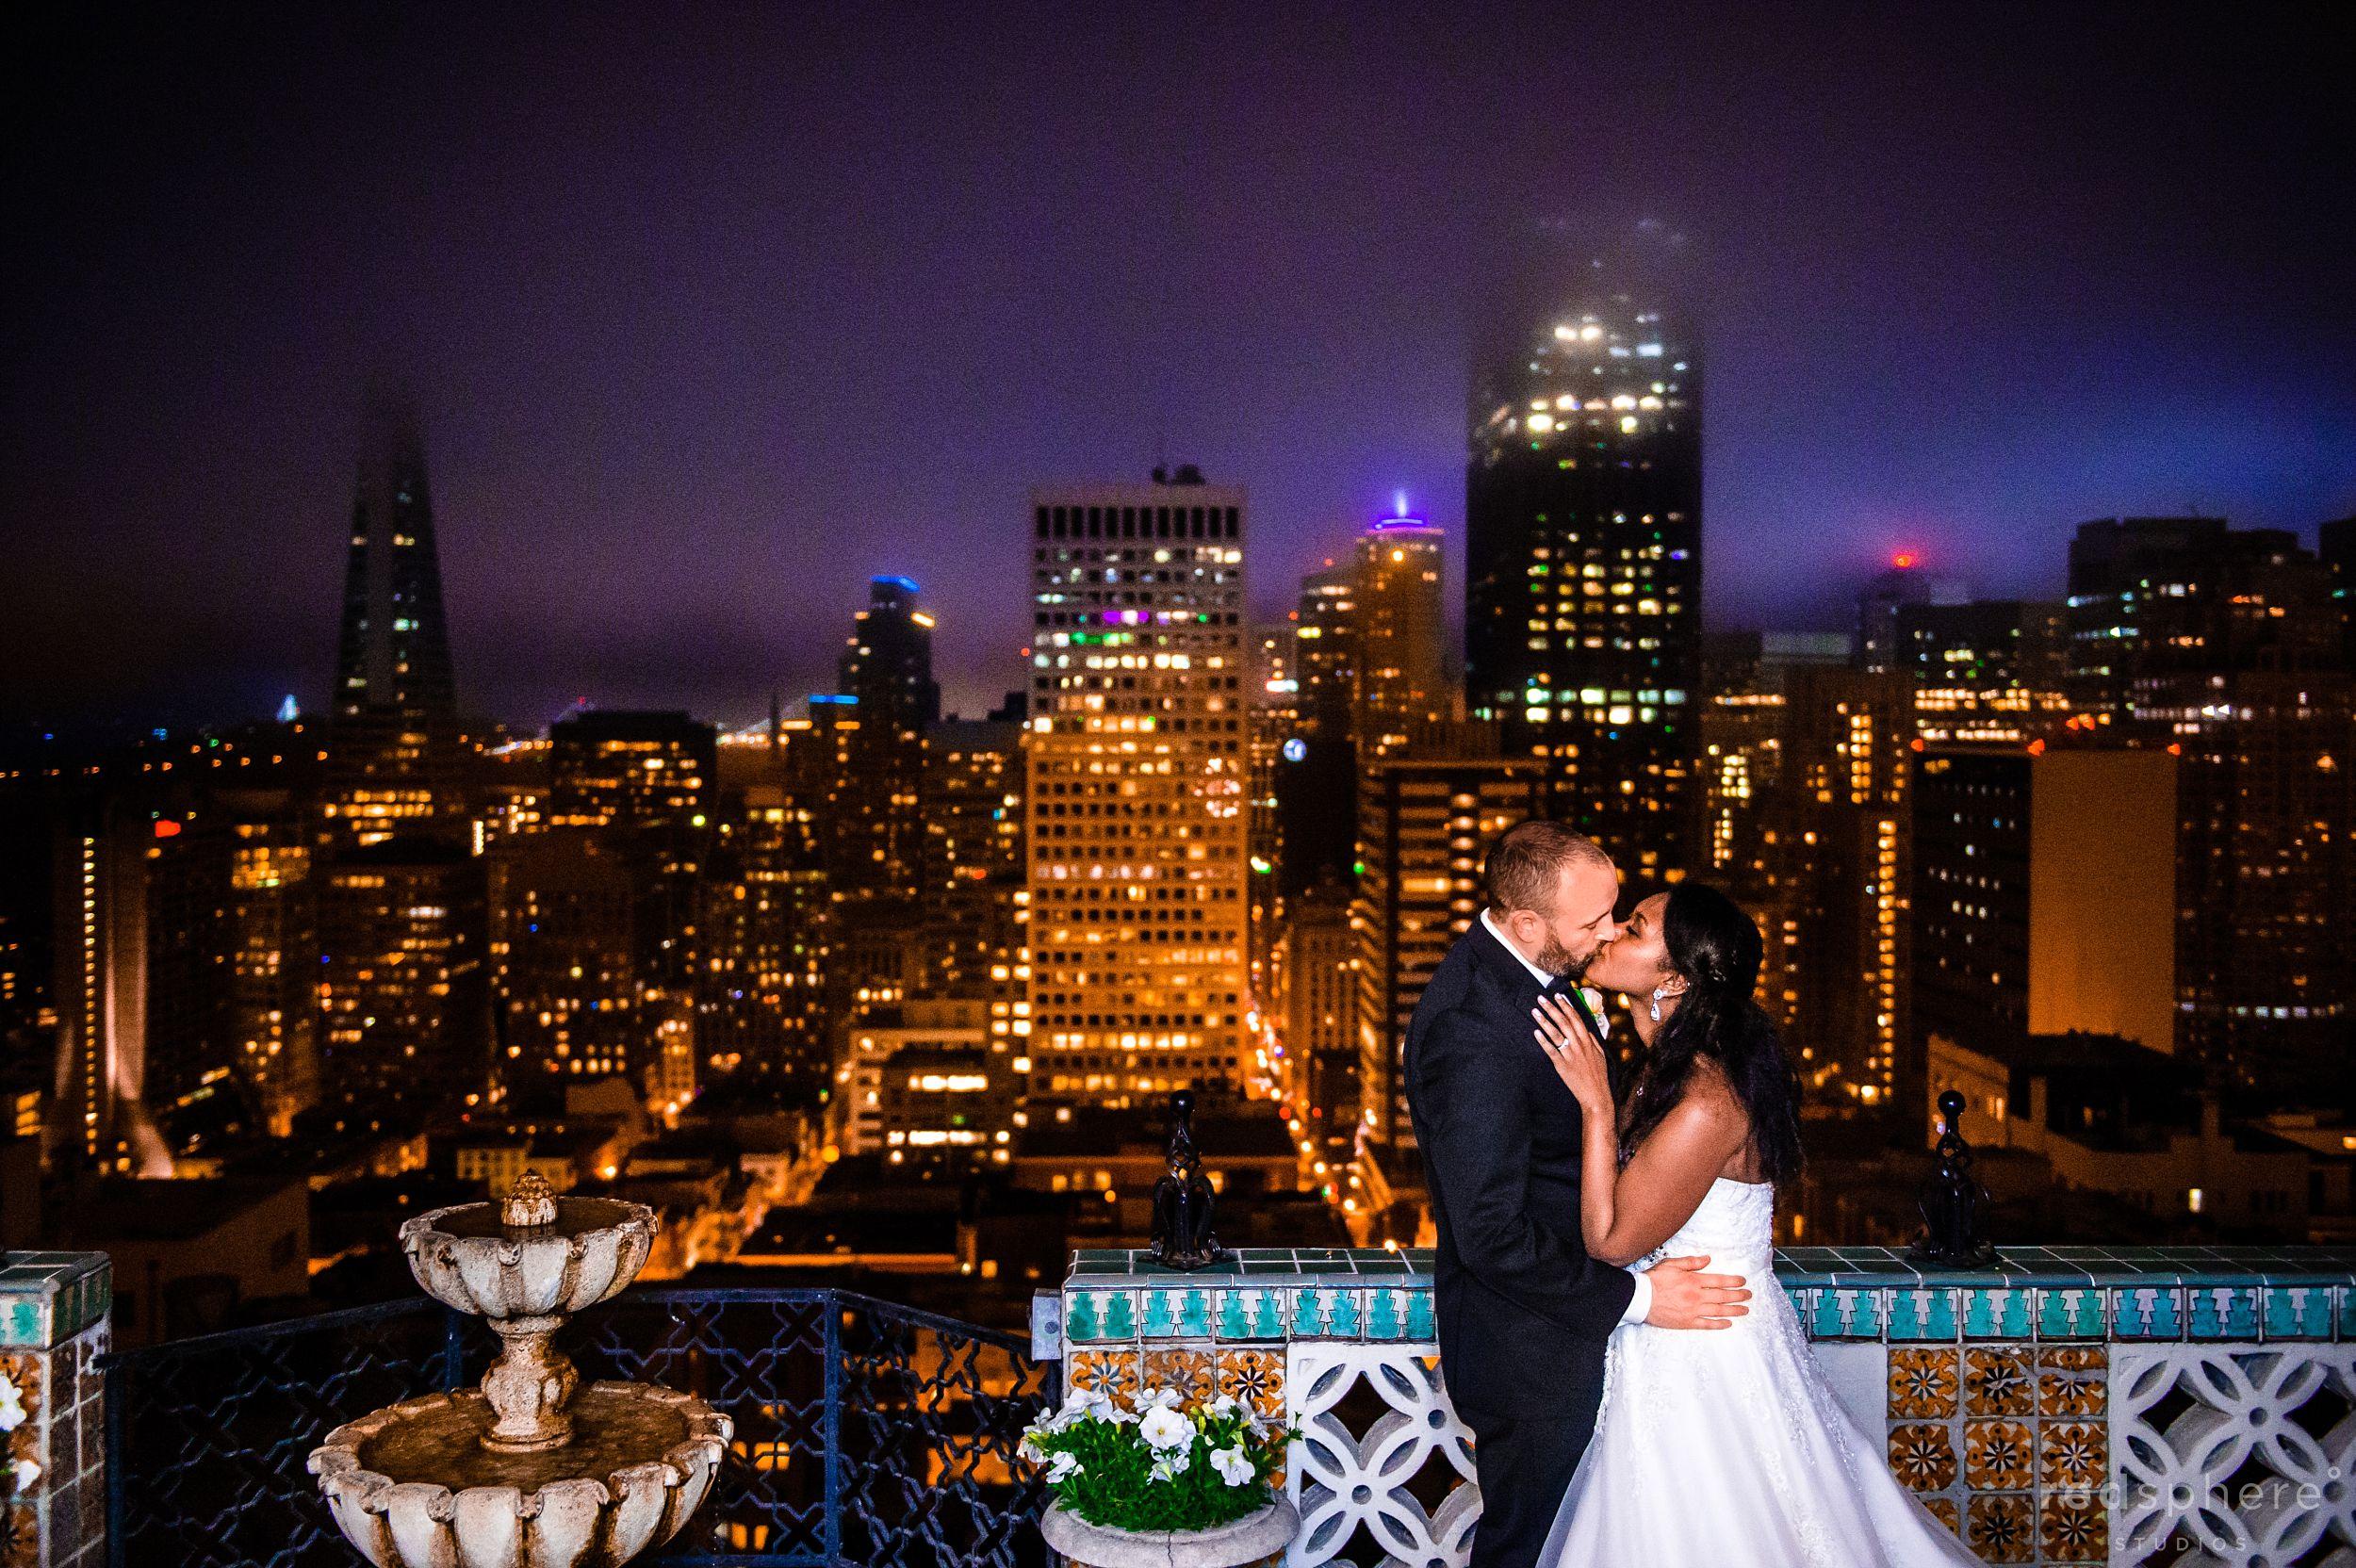 Wedding Kiss Against the Dark San Francisco Skyline, Fairmont Hotel Penthouse Suite